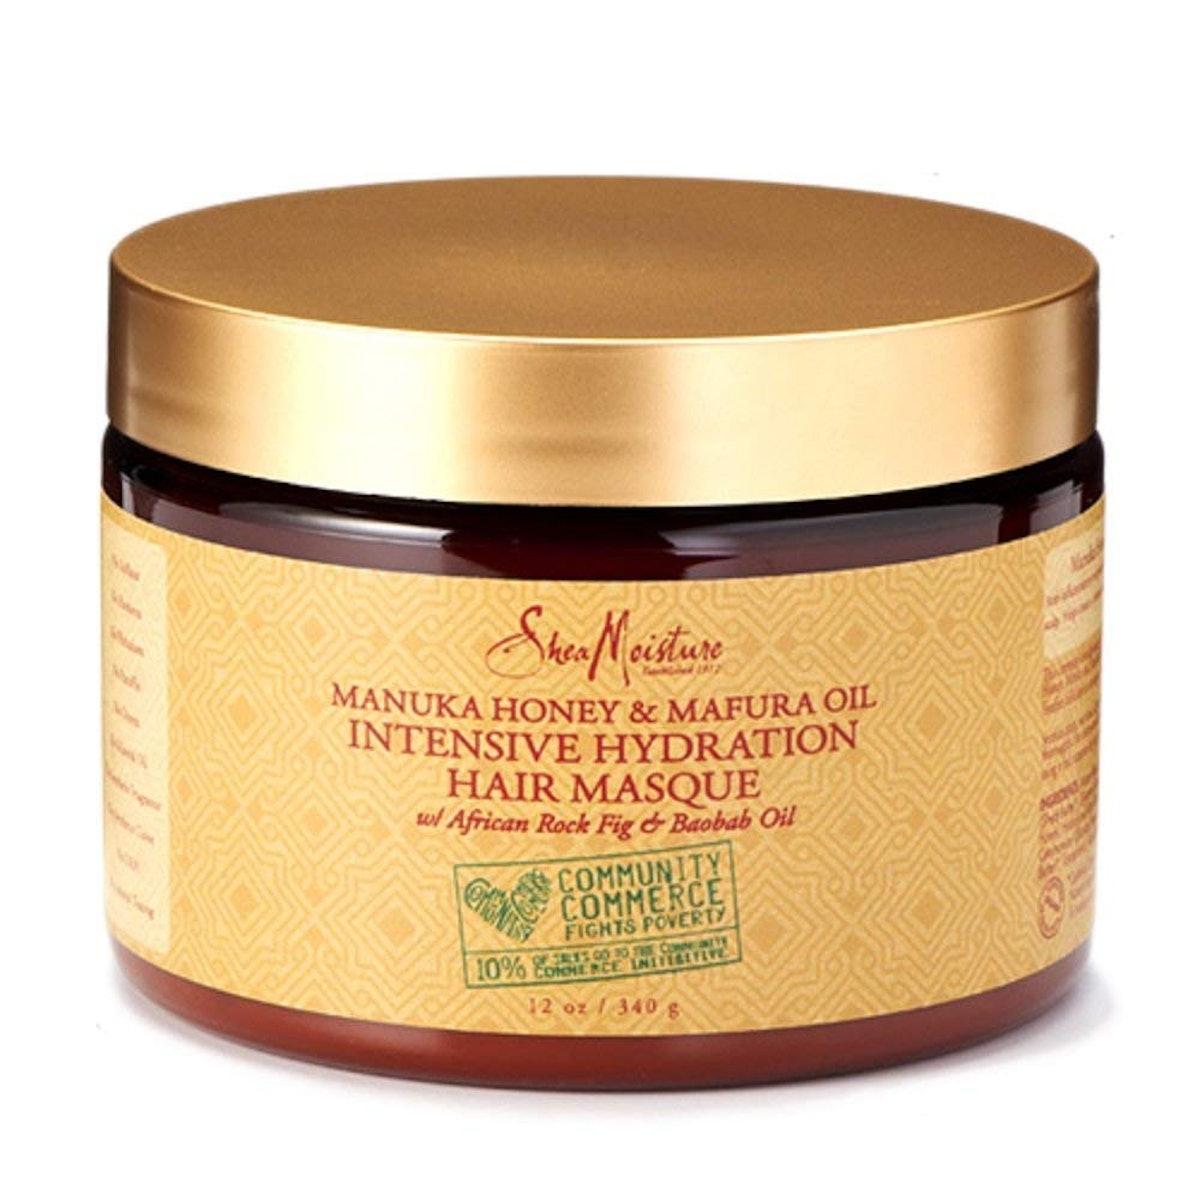 Manuka Honey & Mafura Oil Intensive Hydration Hair Masque